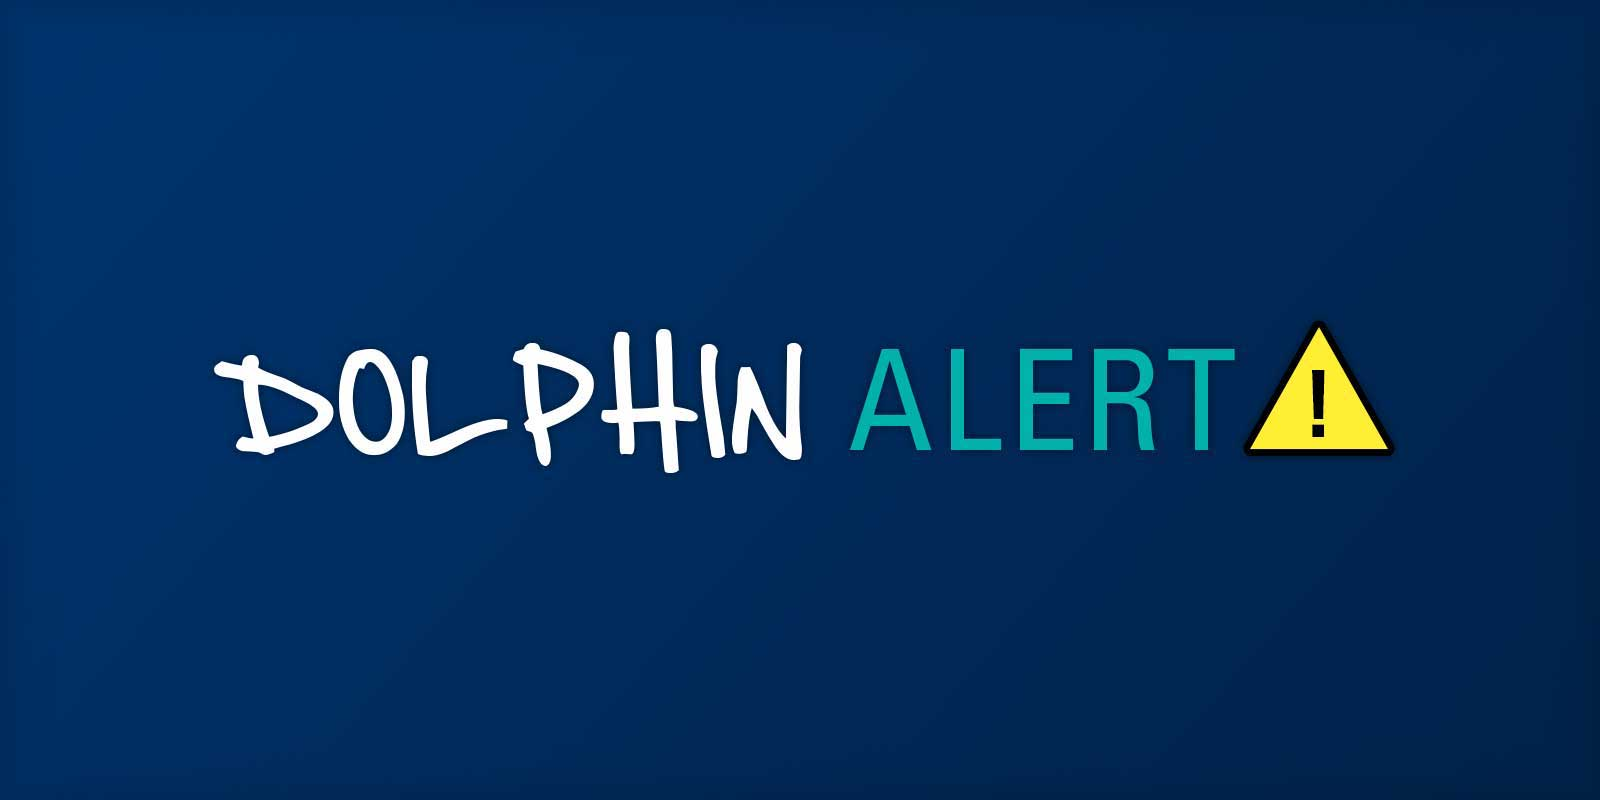 Dolphin_Alert